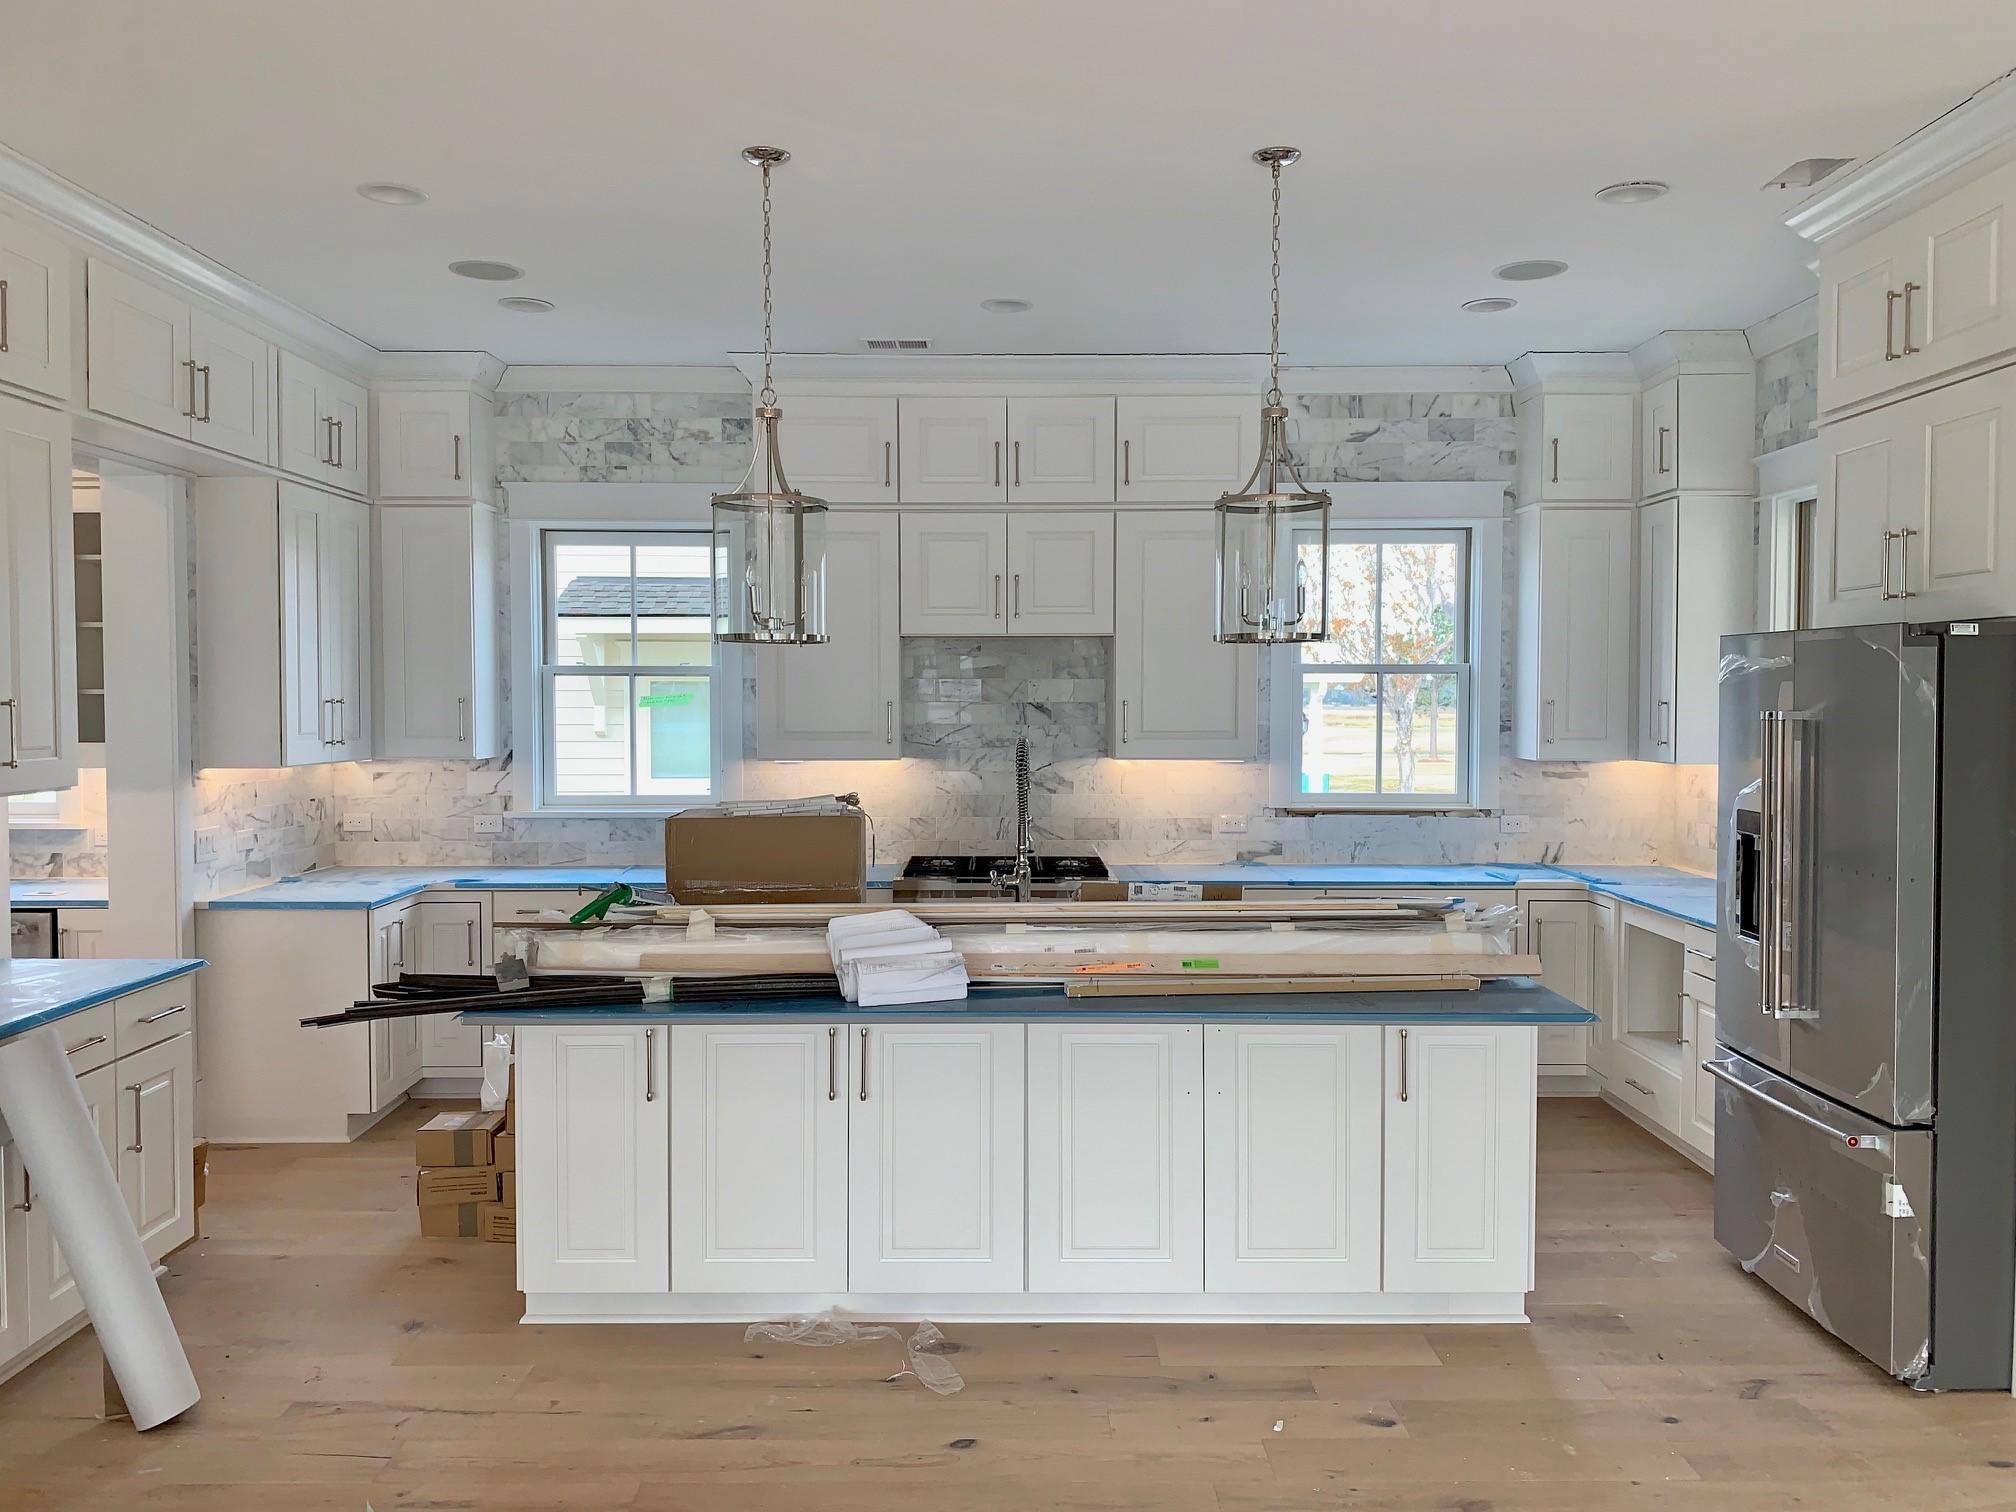 Daniel Island Homes For Sale - 206 Foundry, Charleston, SC - 20